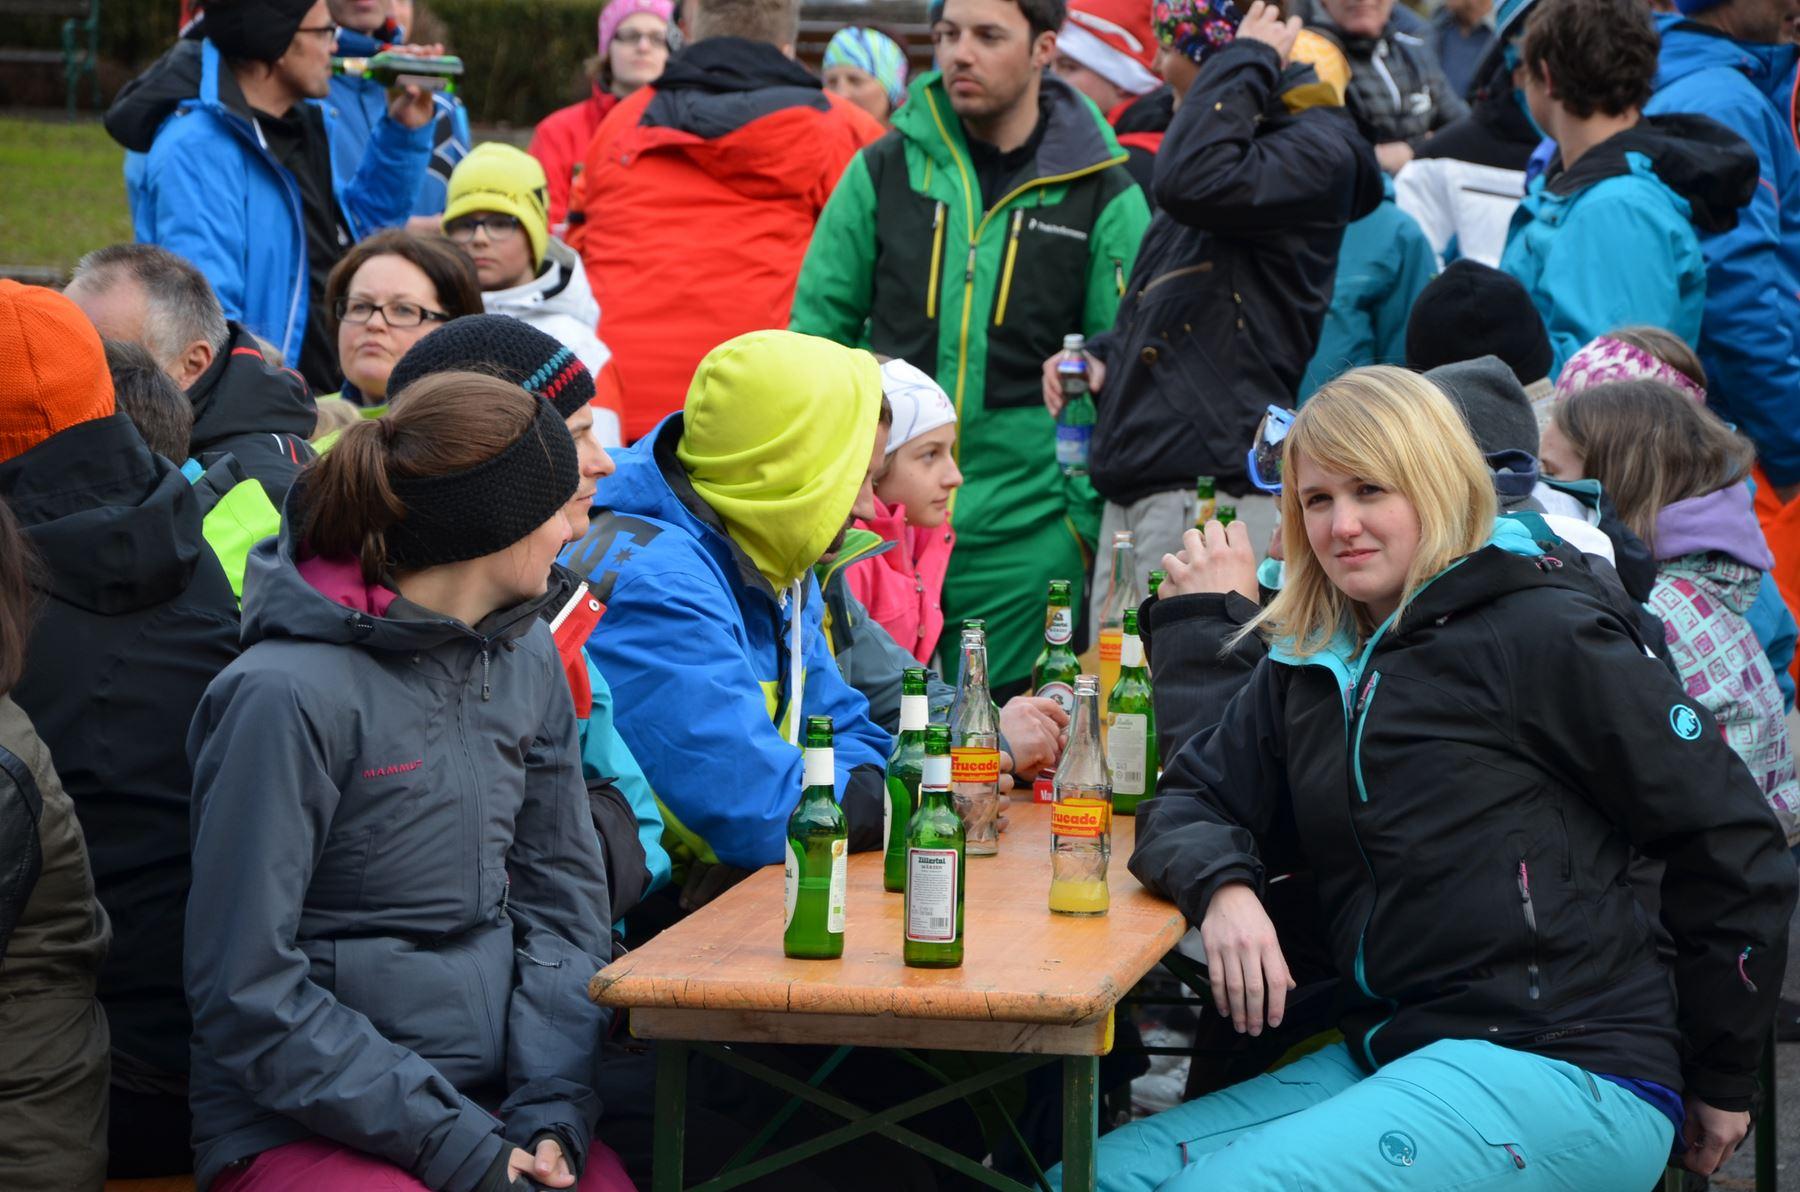 2015-03-22 BV Zillertal Skirennen 370.JPG